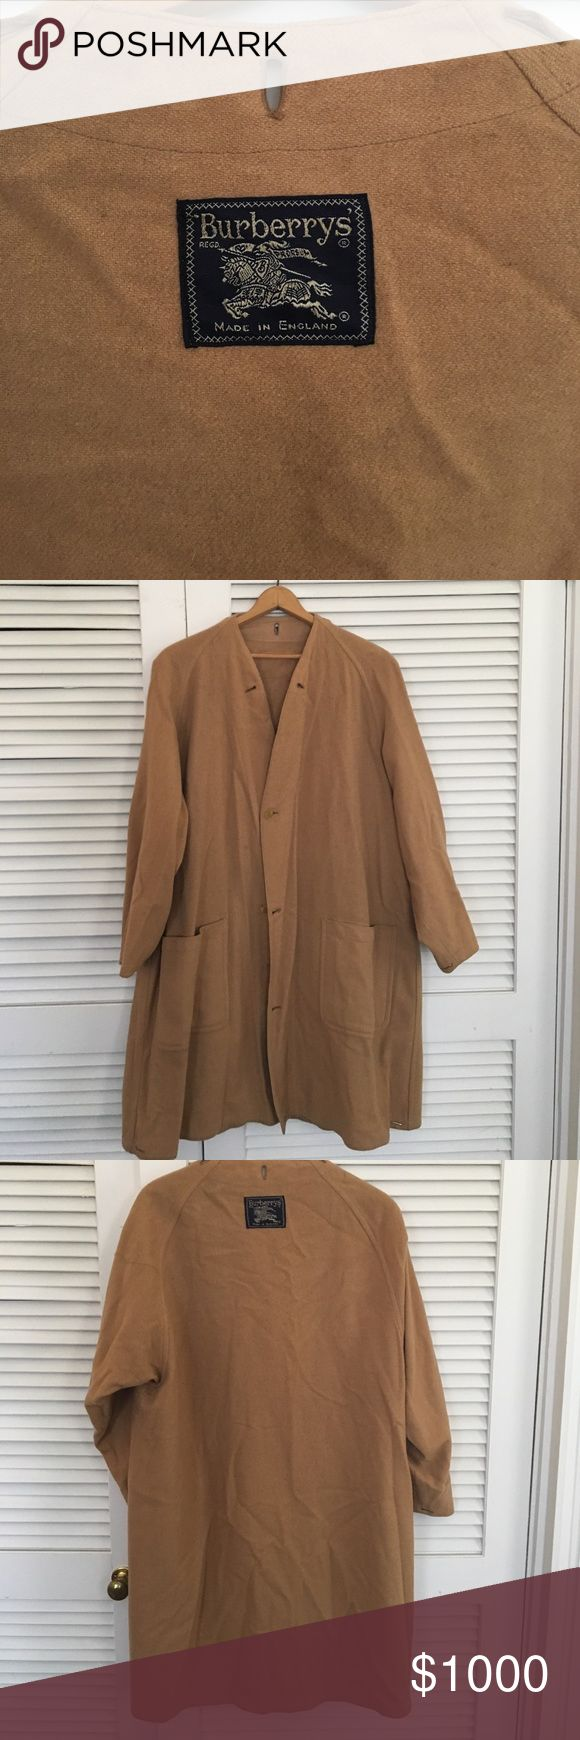 Vintage Burberry tan wool overcoat Original Burberry overcoat from the 1950's. Tan wool and extra large. Very good condition. Burberry Jackets & Coats Trench Coats